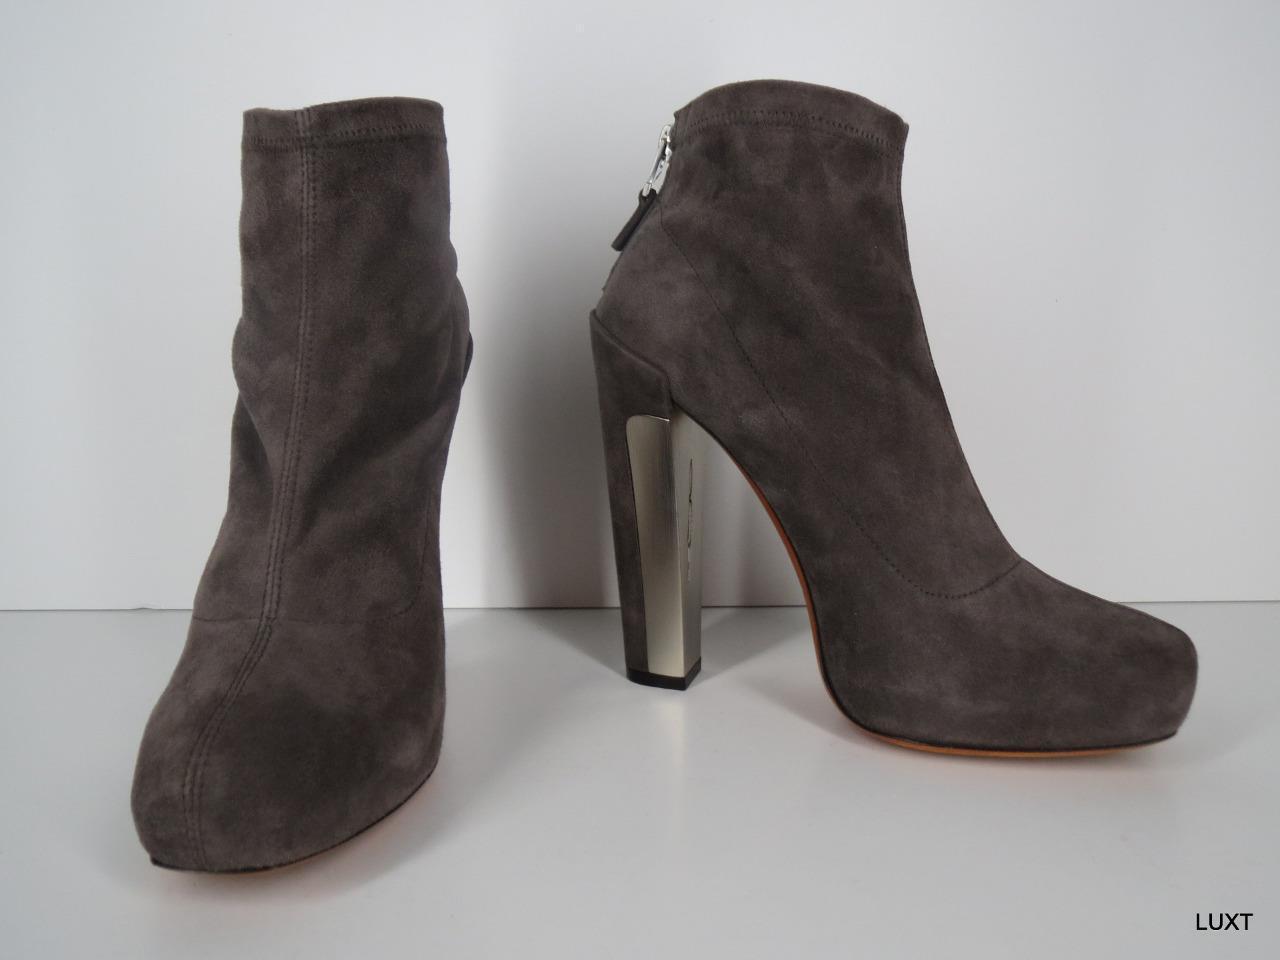 Brian Atwood stivali avvioies Heels  995  Dimensione 6.5 Suede Marronee Platform Ankle Zip  prezzi bassissimi